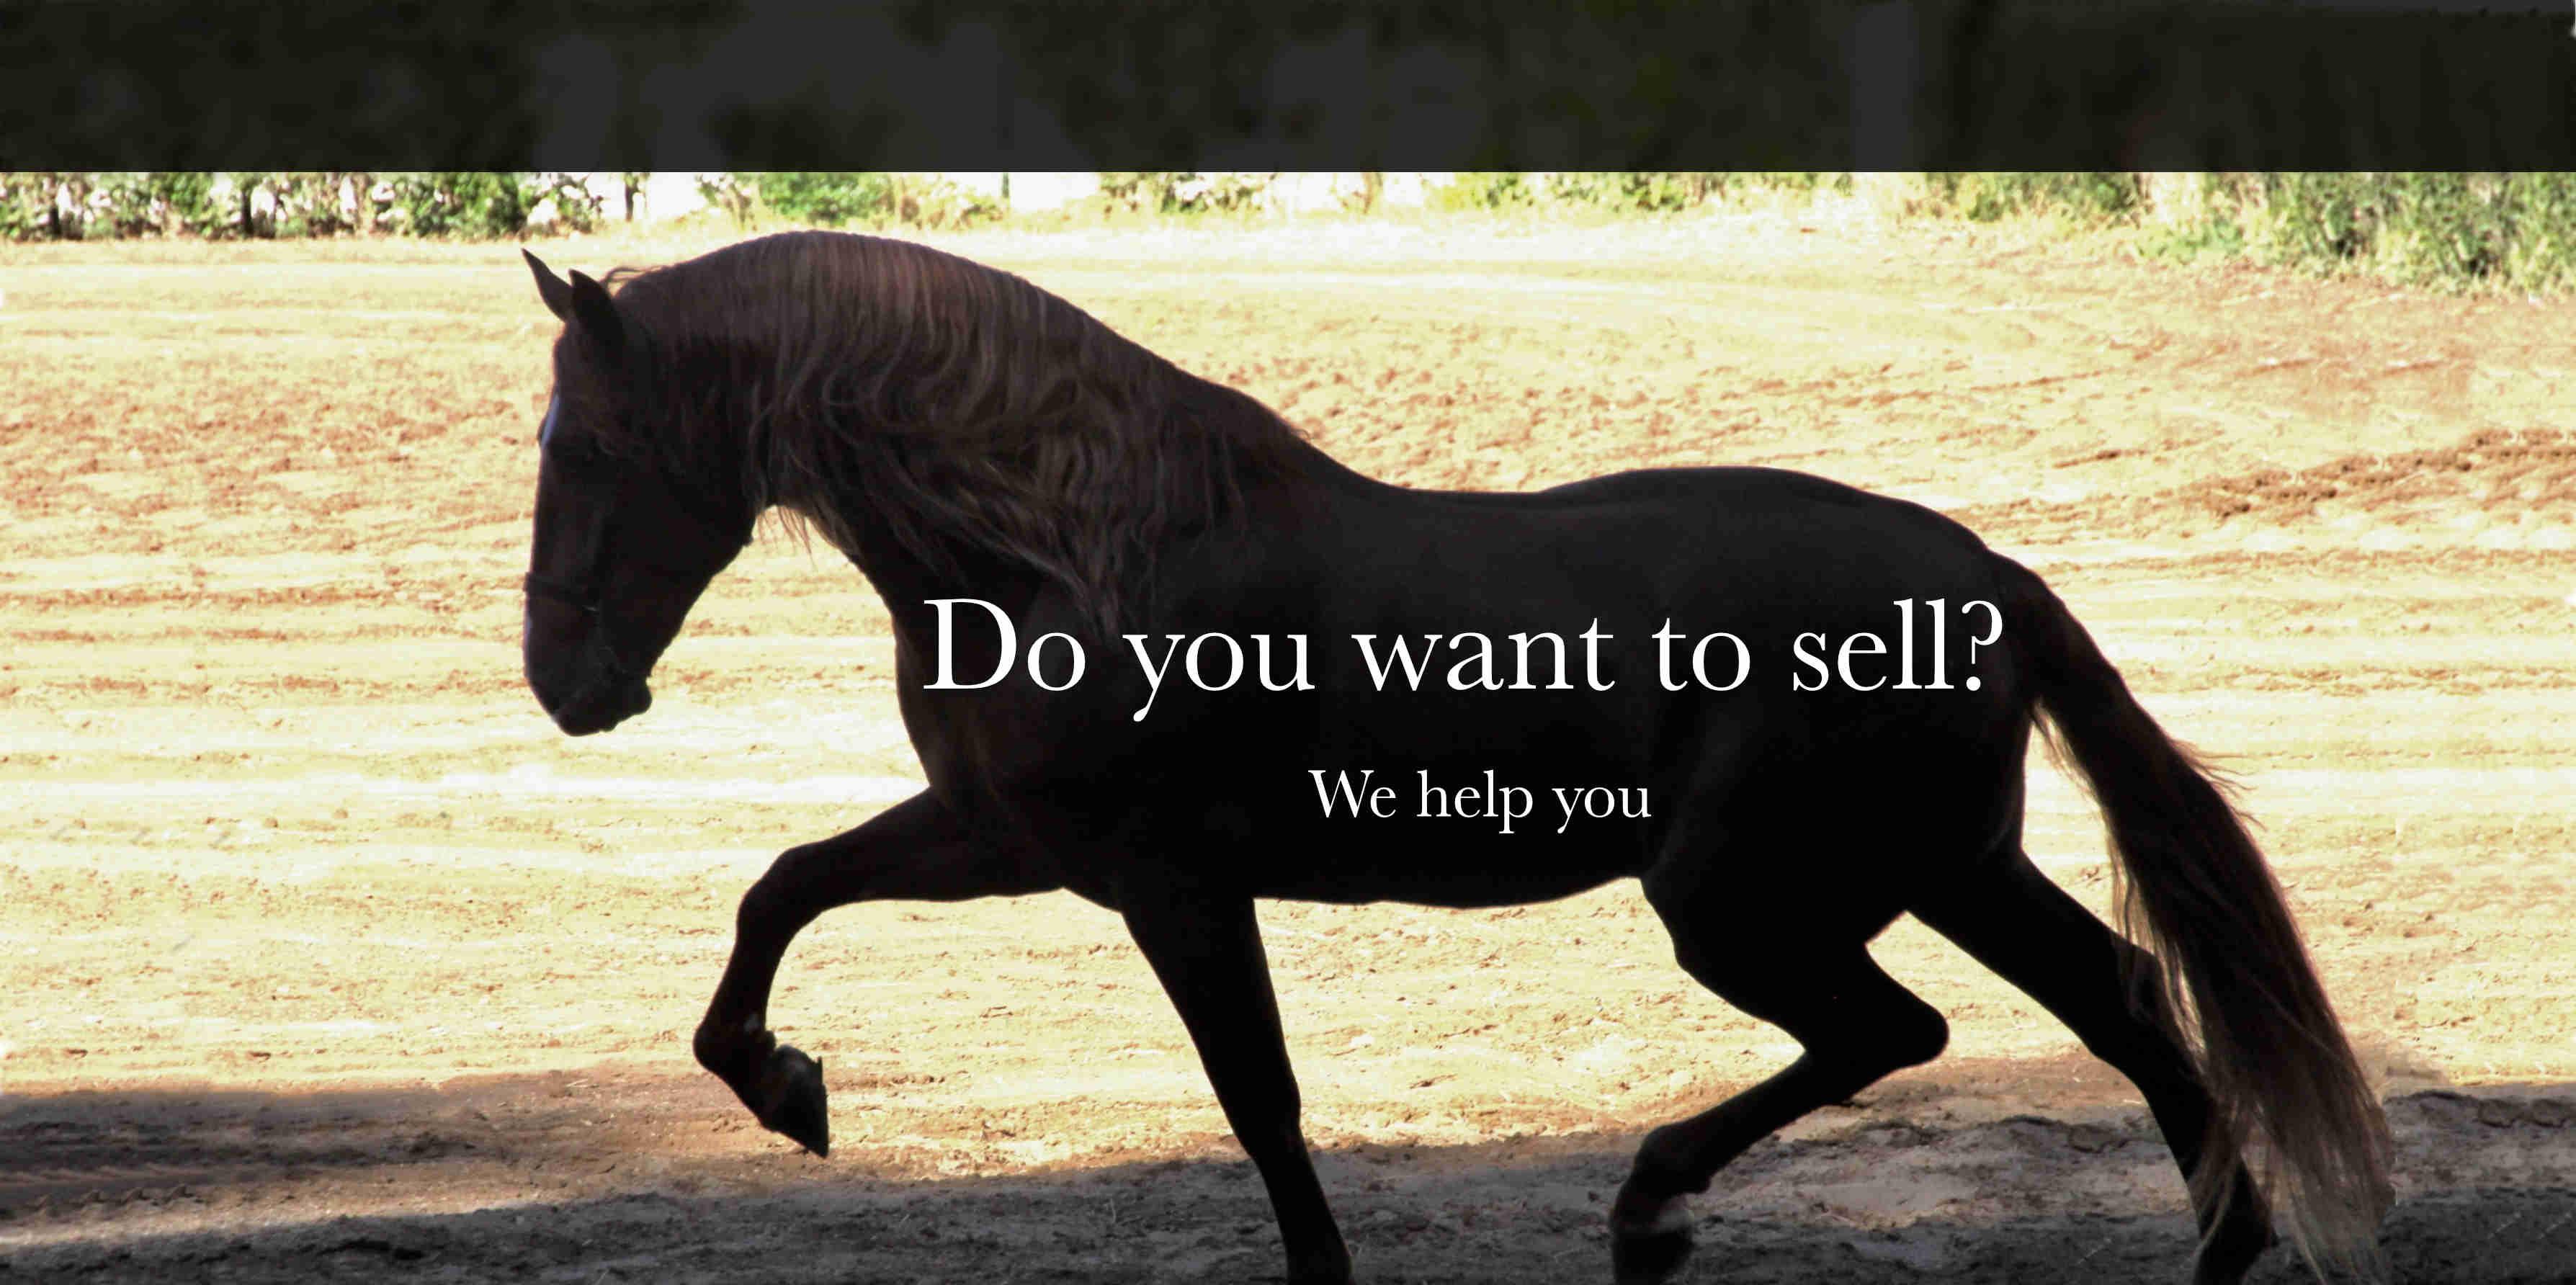 PRE PSL HORSES FOR SALE